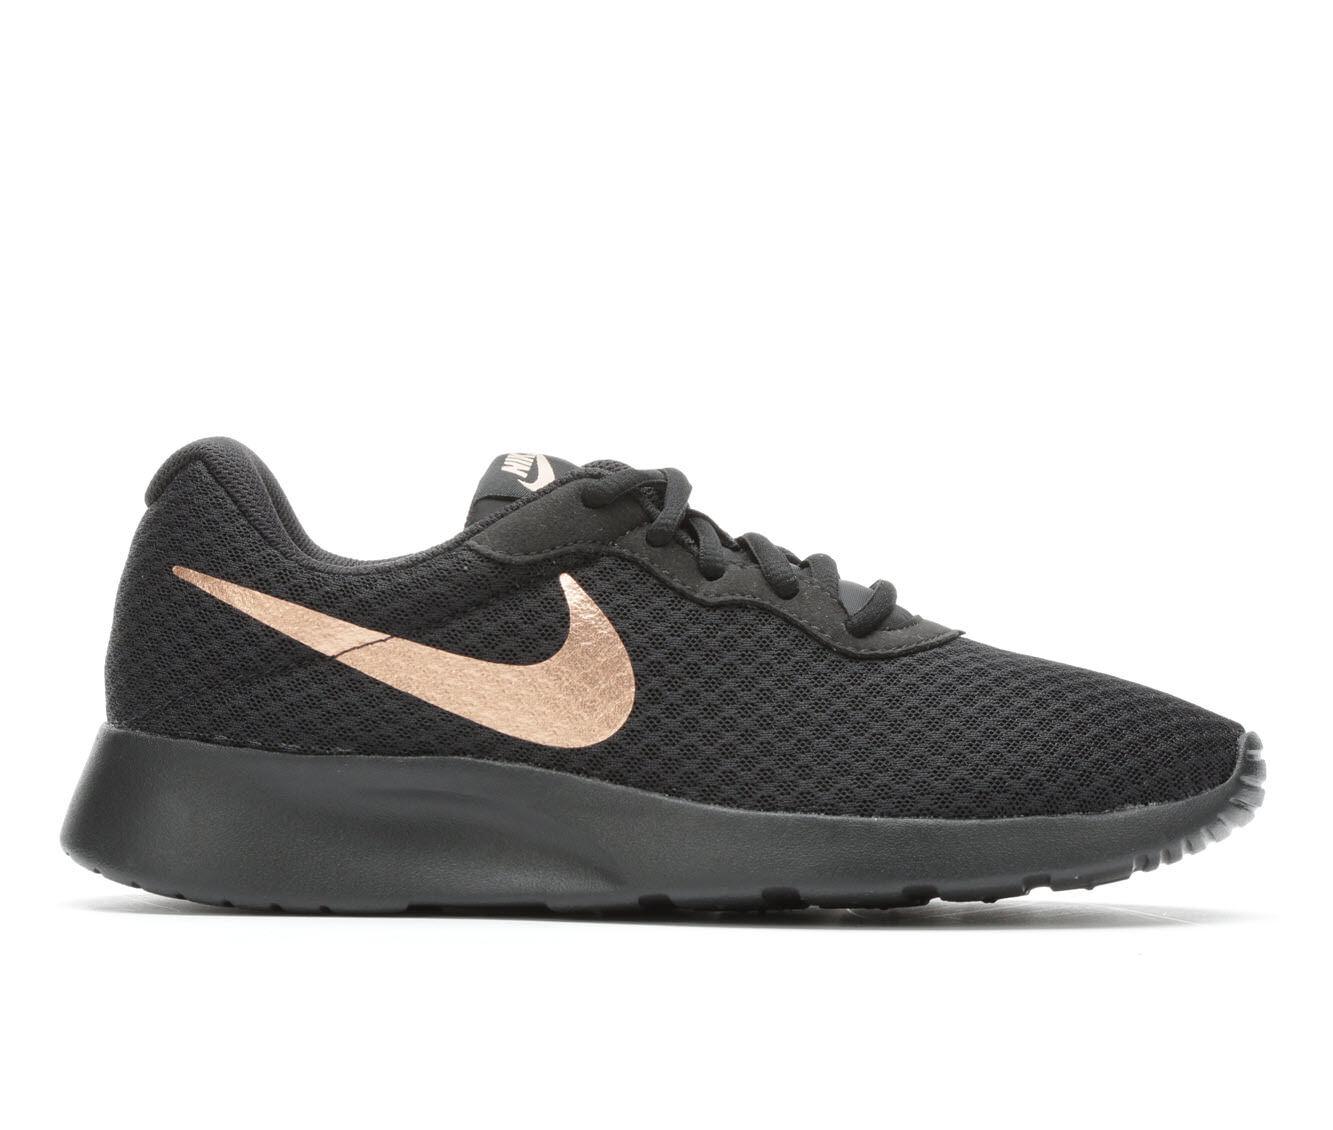 Authentic Store Women's Nike Tanjun Sneakers Blk/Red Bronze